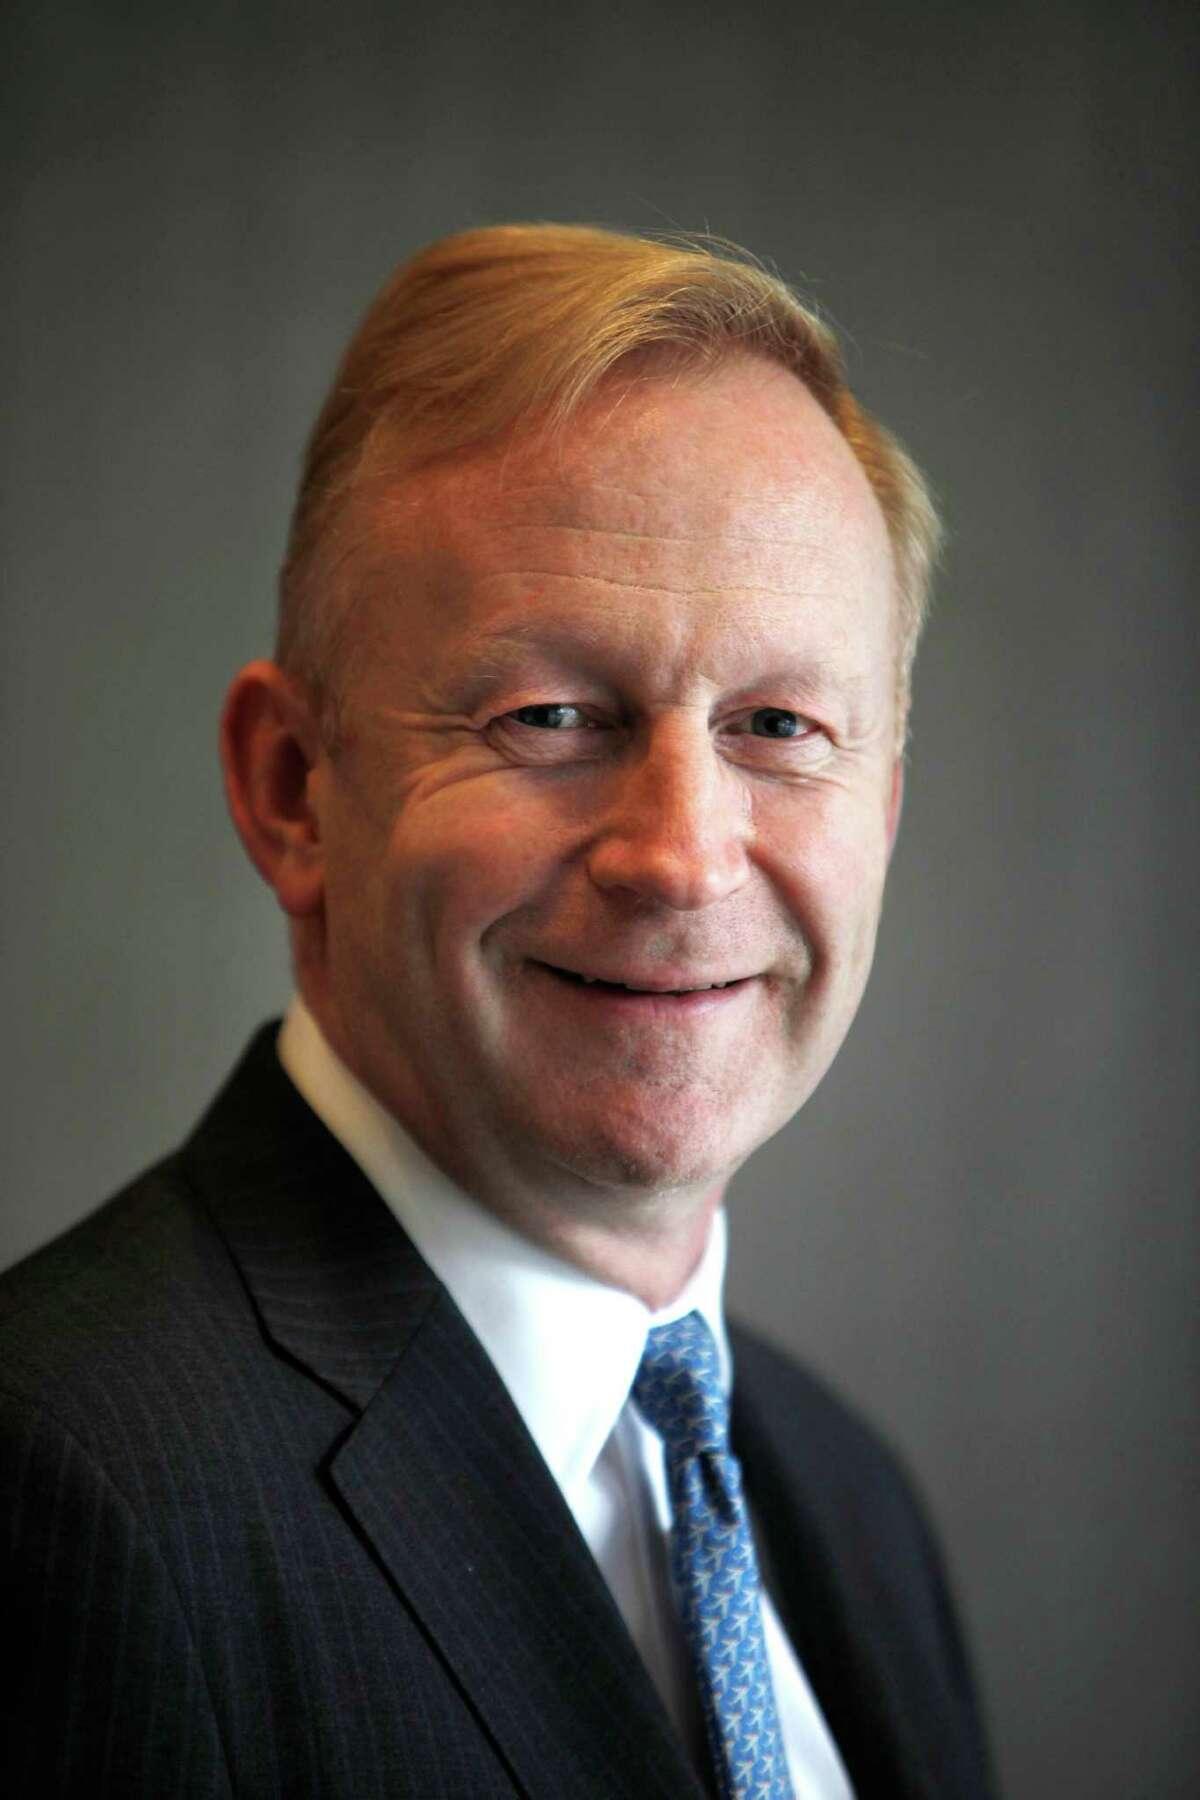 Tishman Speyer senior managing director Carl Shannon is seen in the Lumina sales gallery on Thursday, September 18, 2014 in San Francisco, Calif.